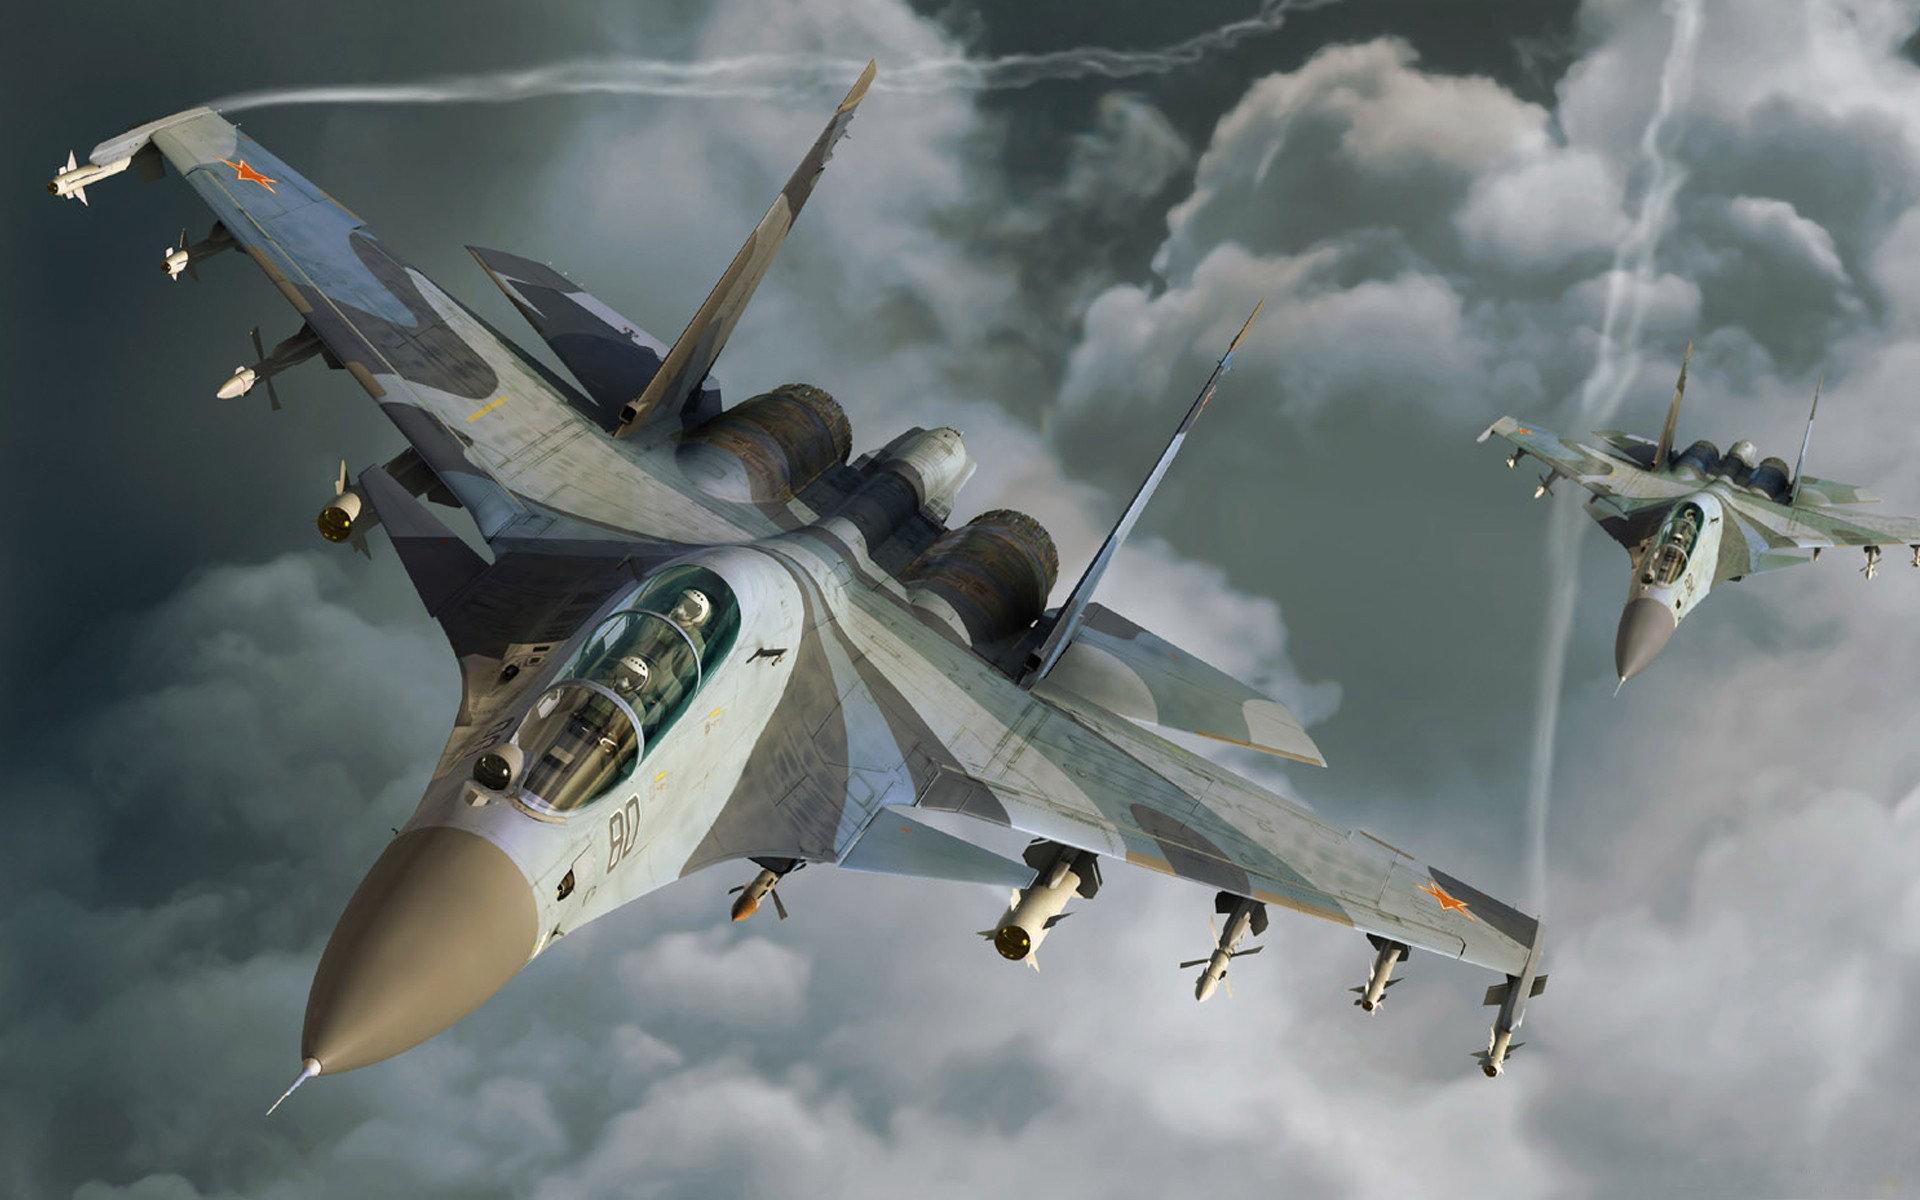 Sukhoi Su 30 Wallpapers Hd For Desktop Backgrounds Images, Photos, Reviews